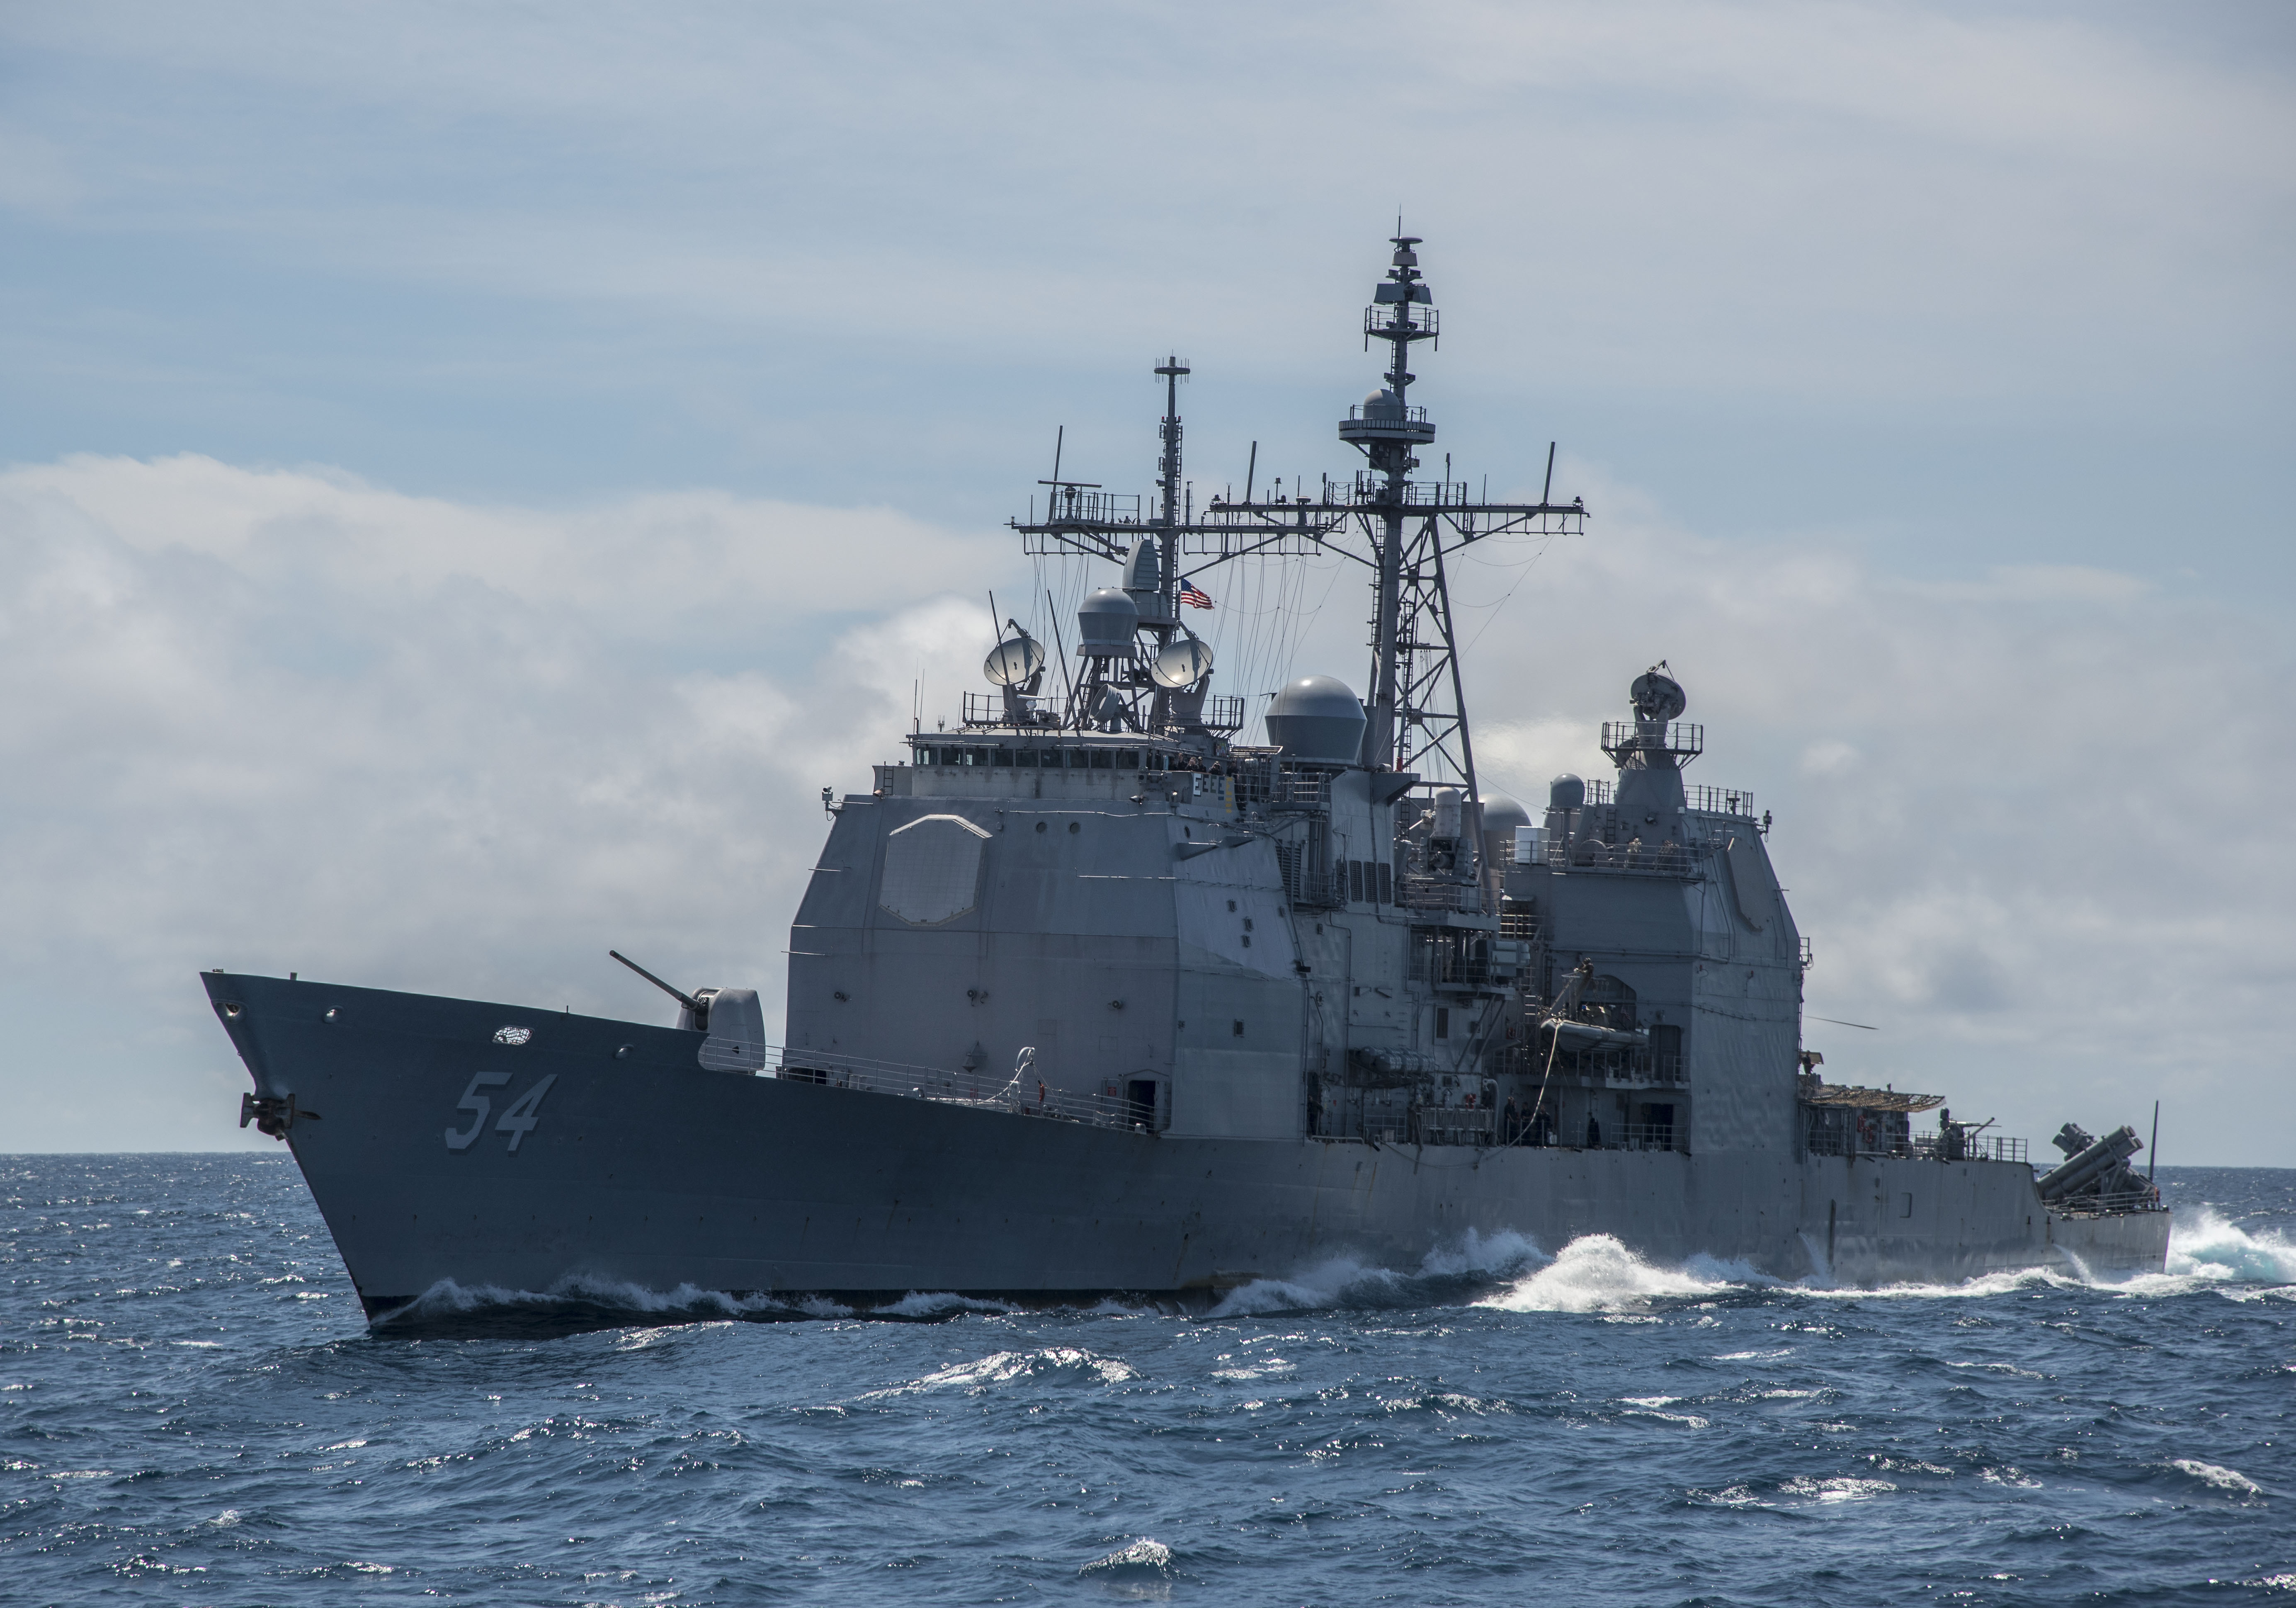 Officials: Navy cruiser ran aground near Japan